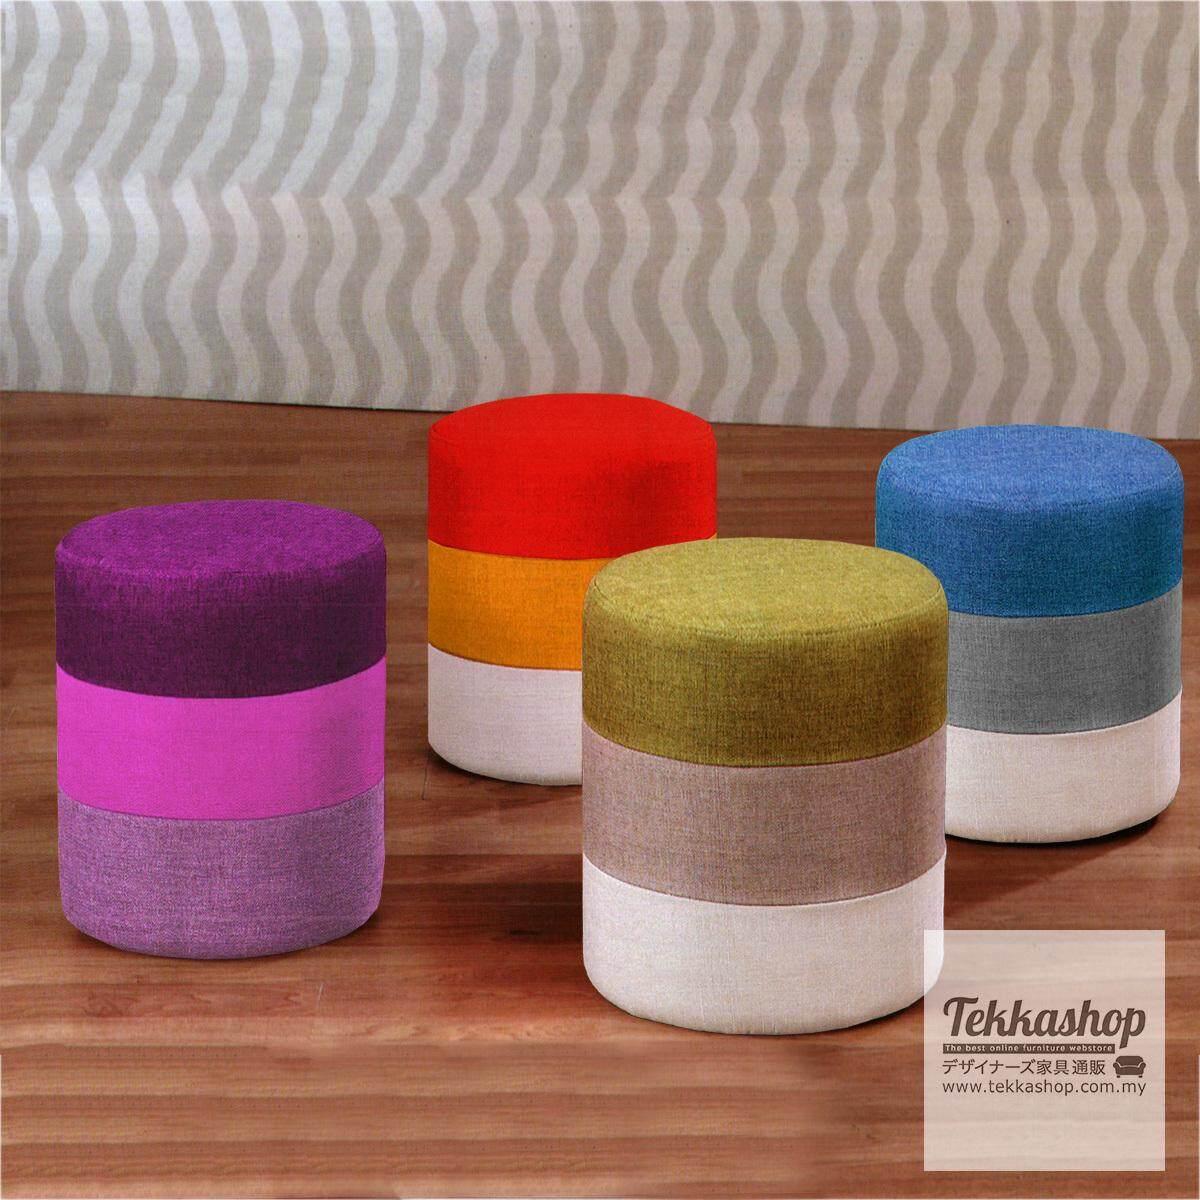 Tekkashop KKM882LC Fabric 3 Layers Round Cube Ottoman Foot Stool (Green)